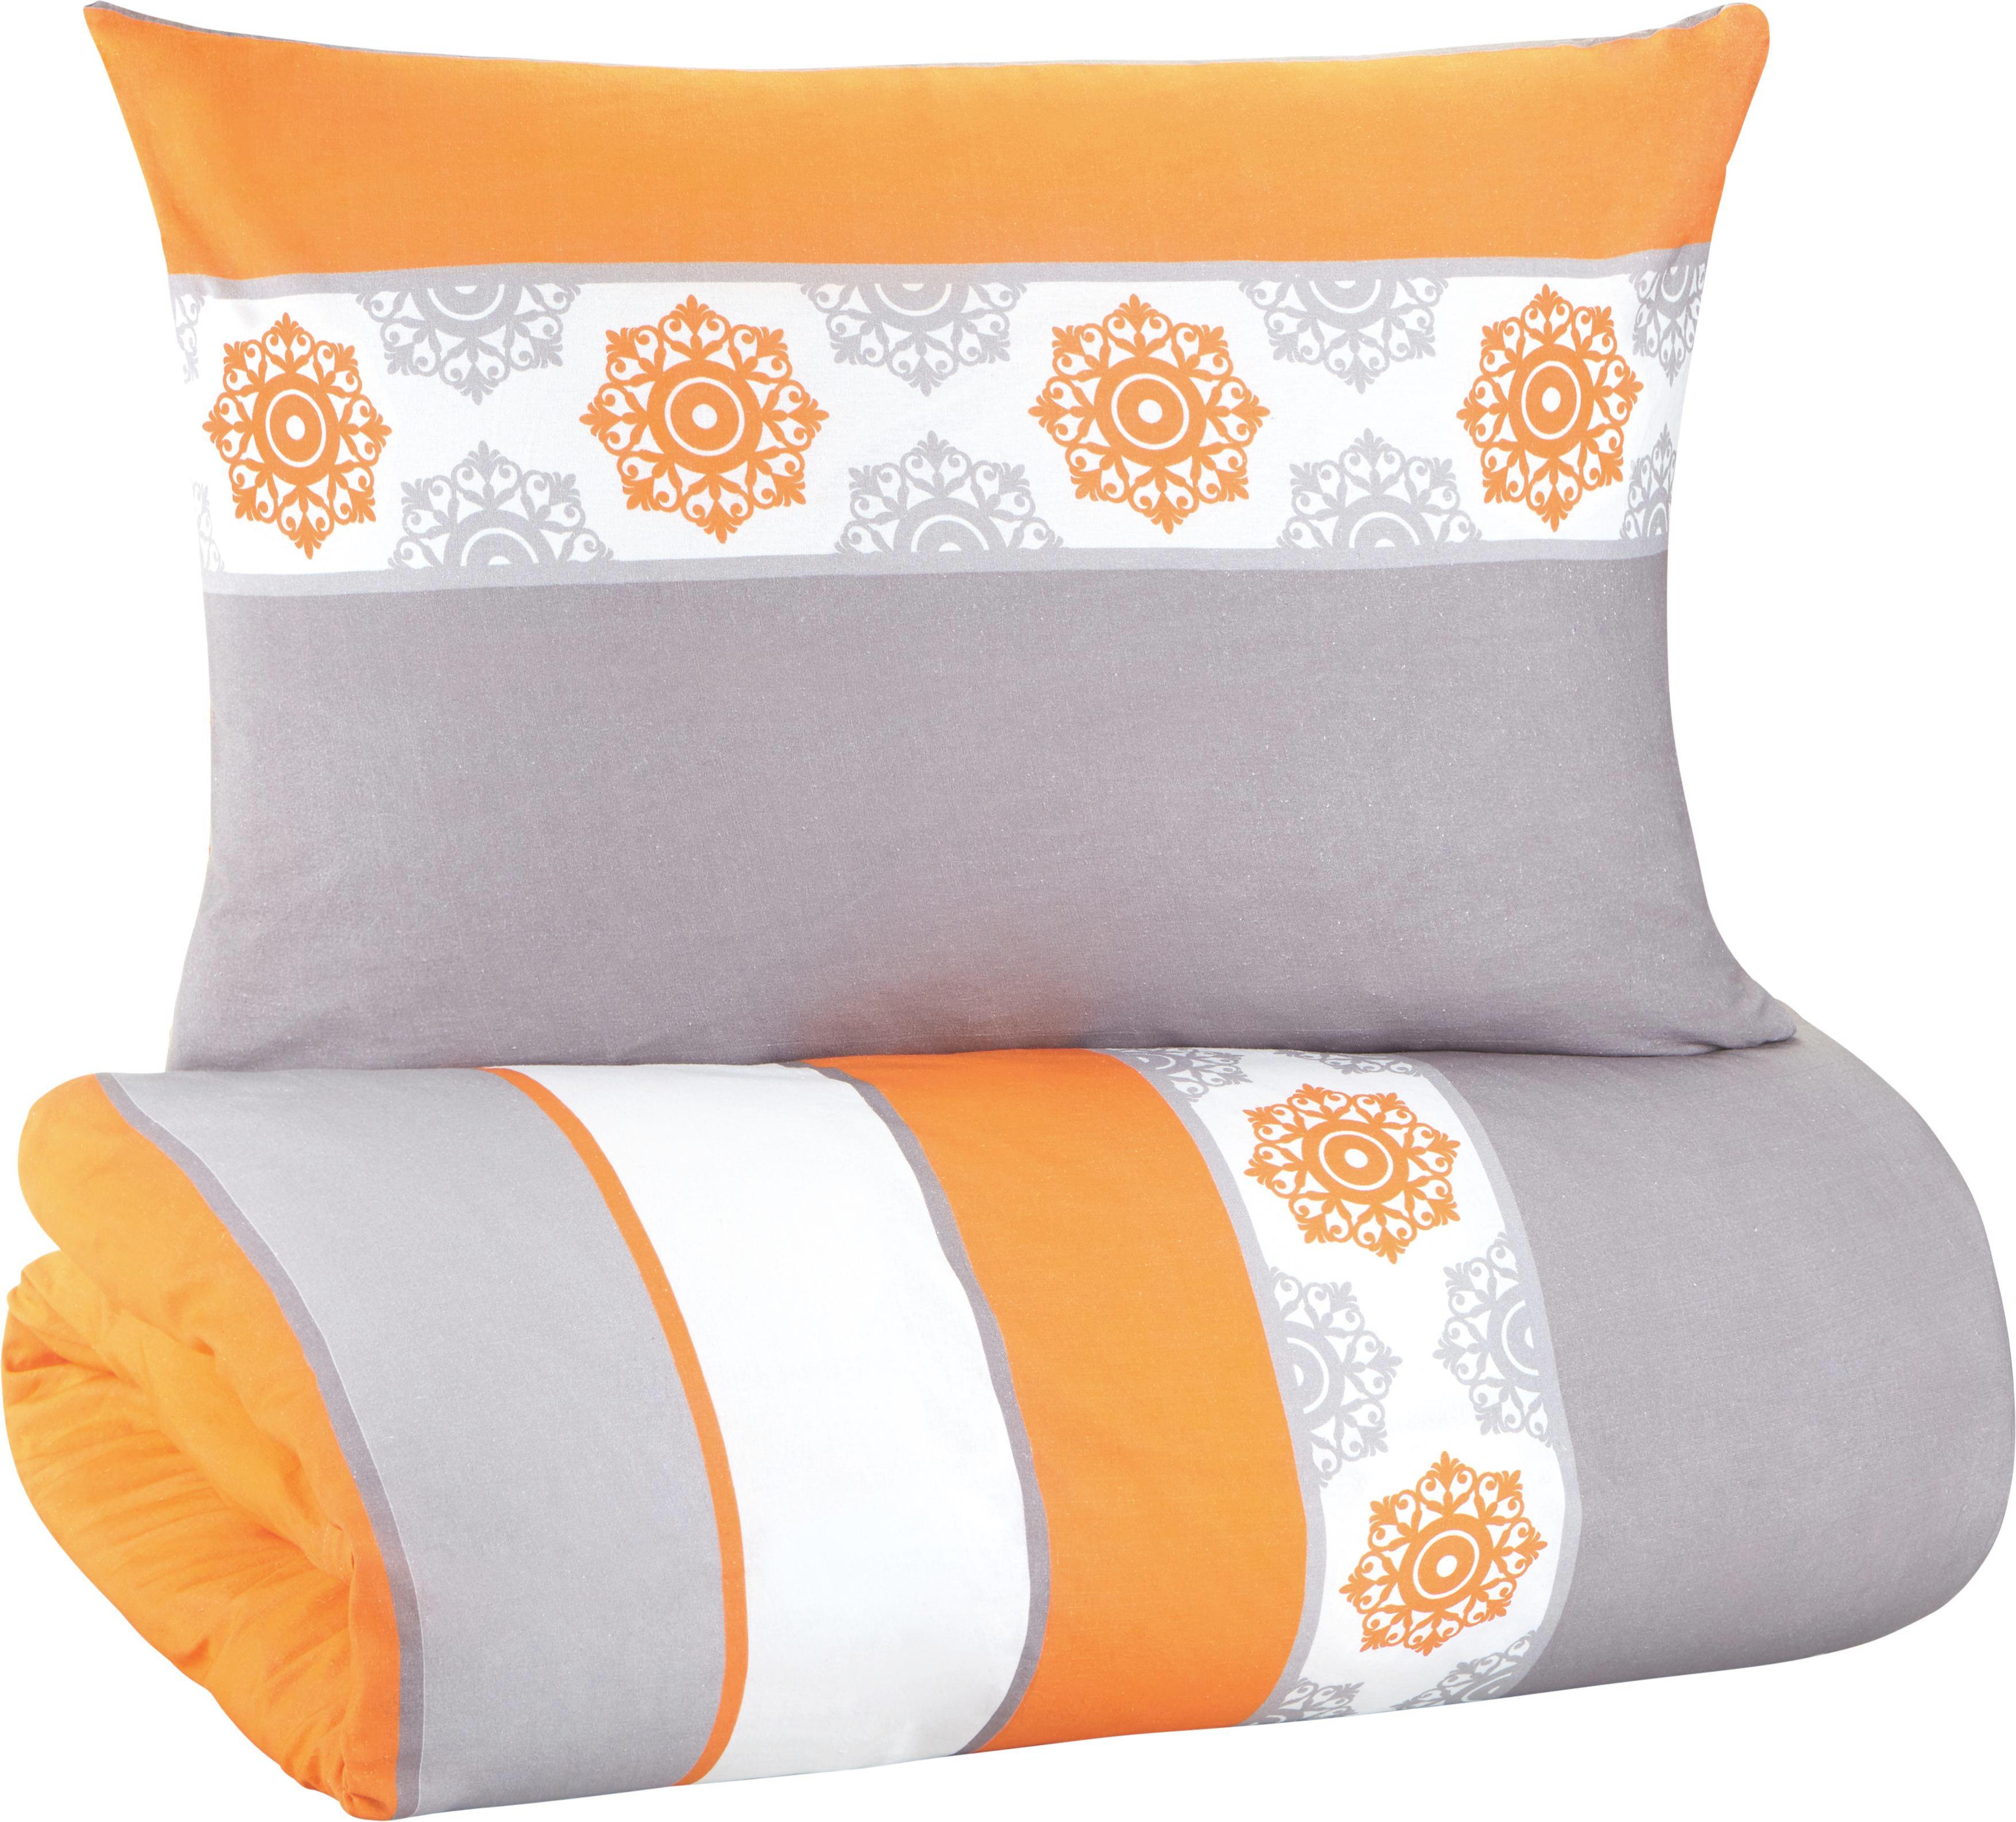 Bettwäsche Claudia ca. 135x200cm - Altrosa/Orange, Textil (135/200cm) - MÖMAX modern living